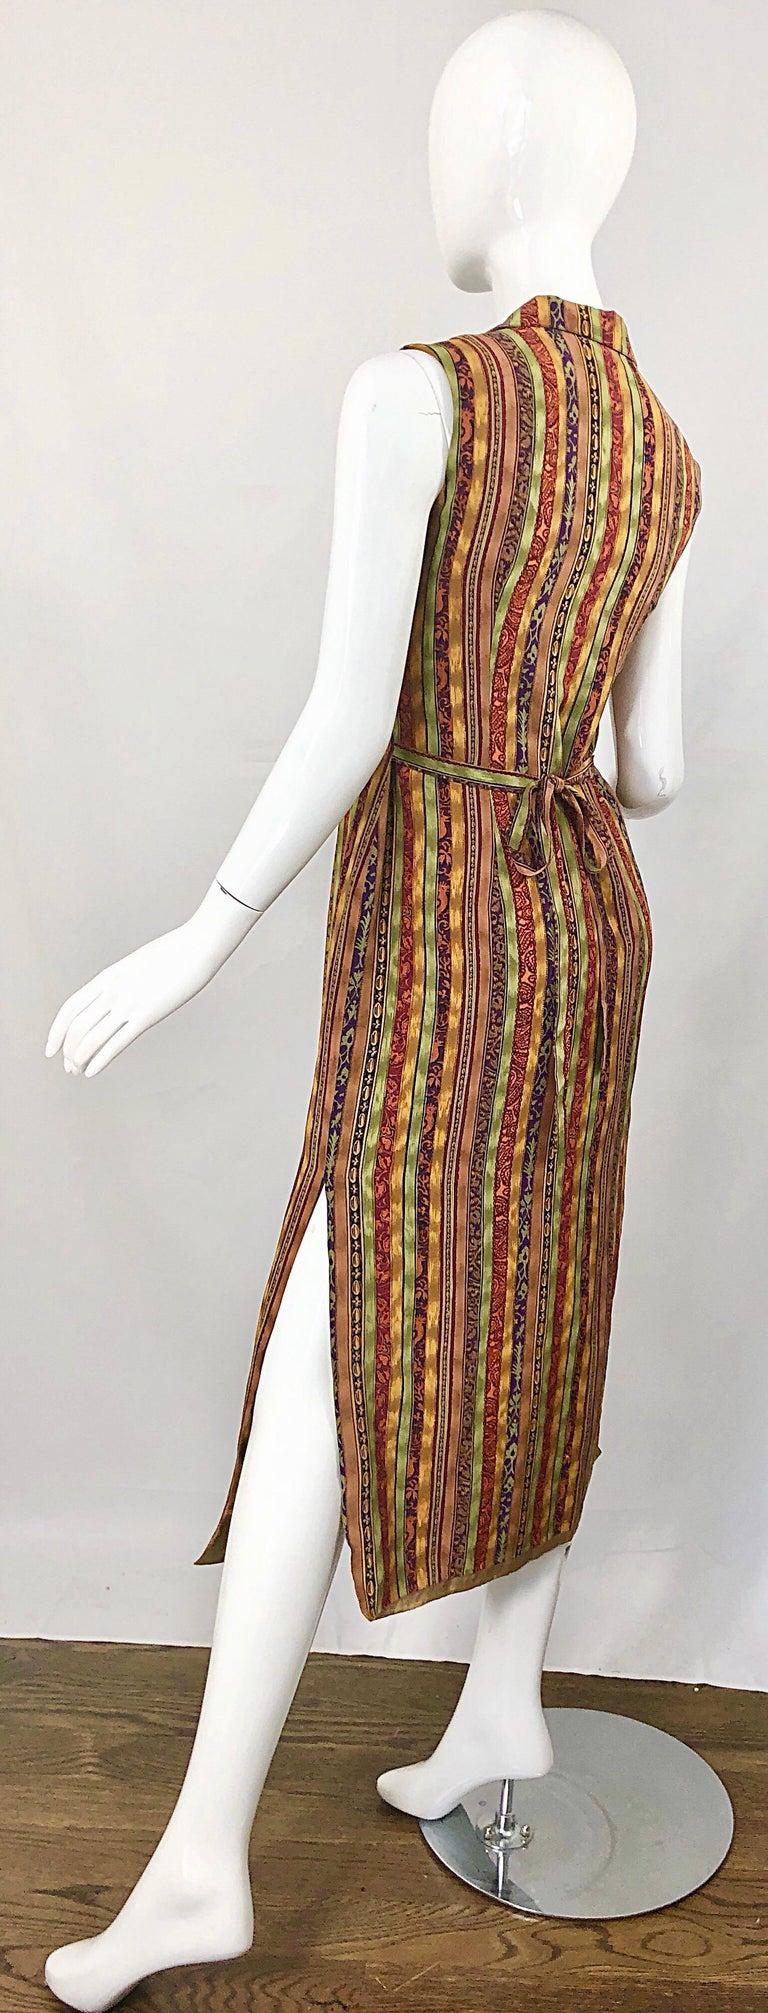 1990s Boho Silk Warm Color Vertical Aztec Stripe Sleeveless 90s Midi Shirt Dress For Sale 11